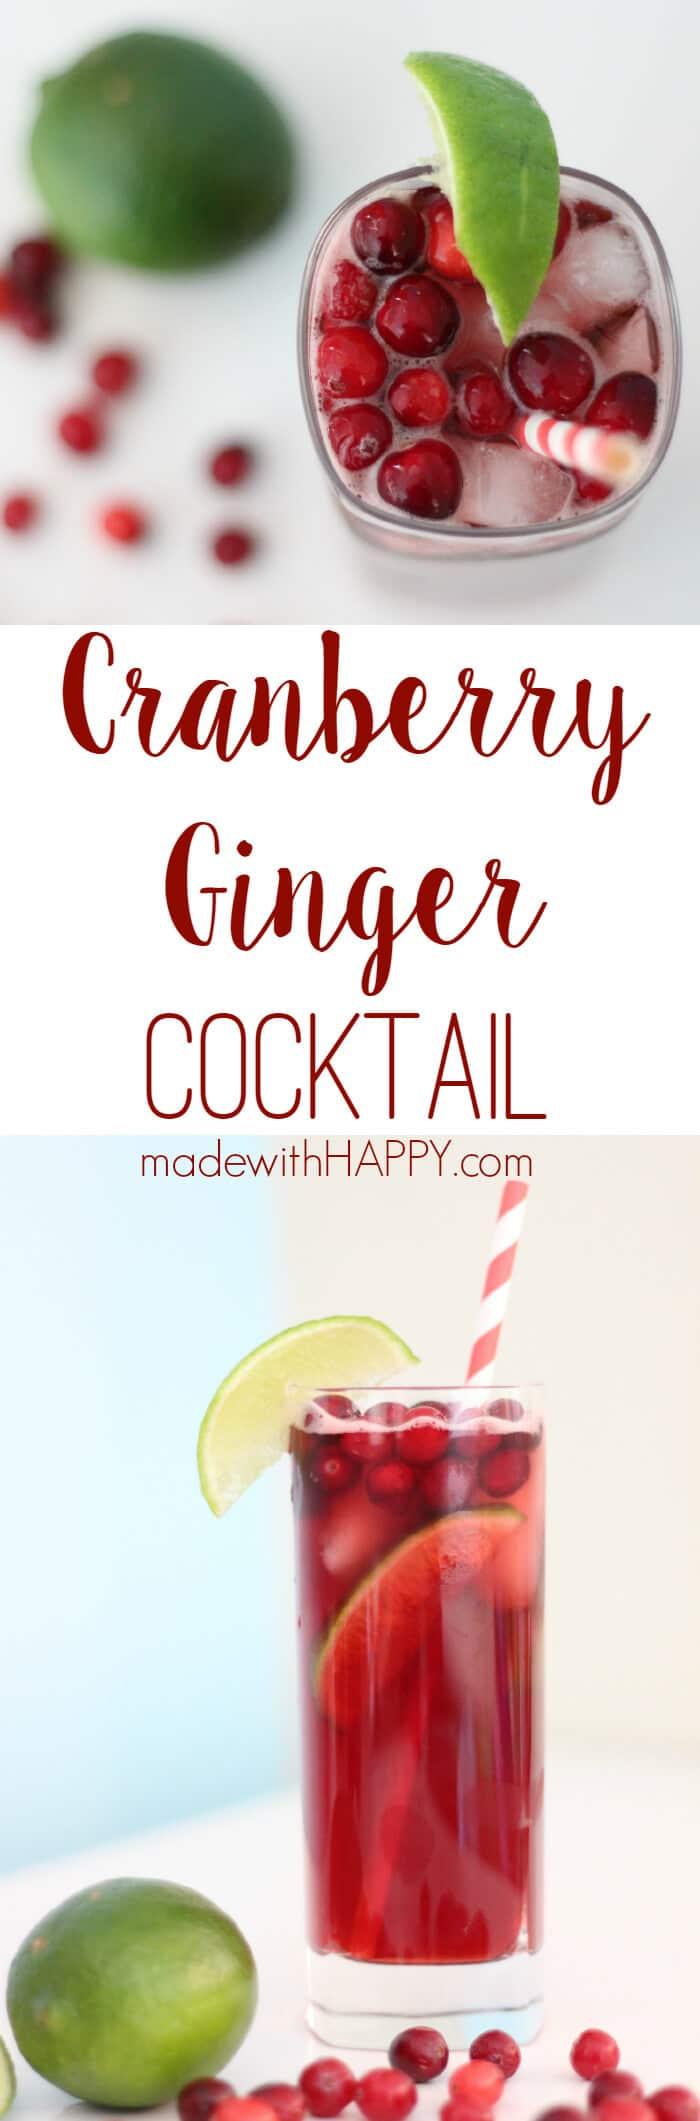 Cranberry Ginger Cocktail Recipe | Low Calorie Cranberry Ginger Cocktail | www.madewithHAPPY.com | #SweetNLowStar #client